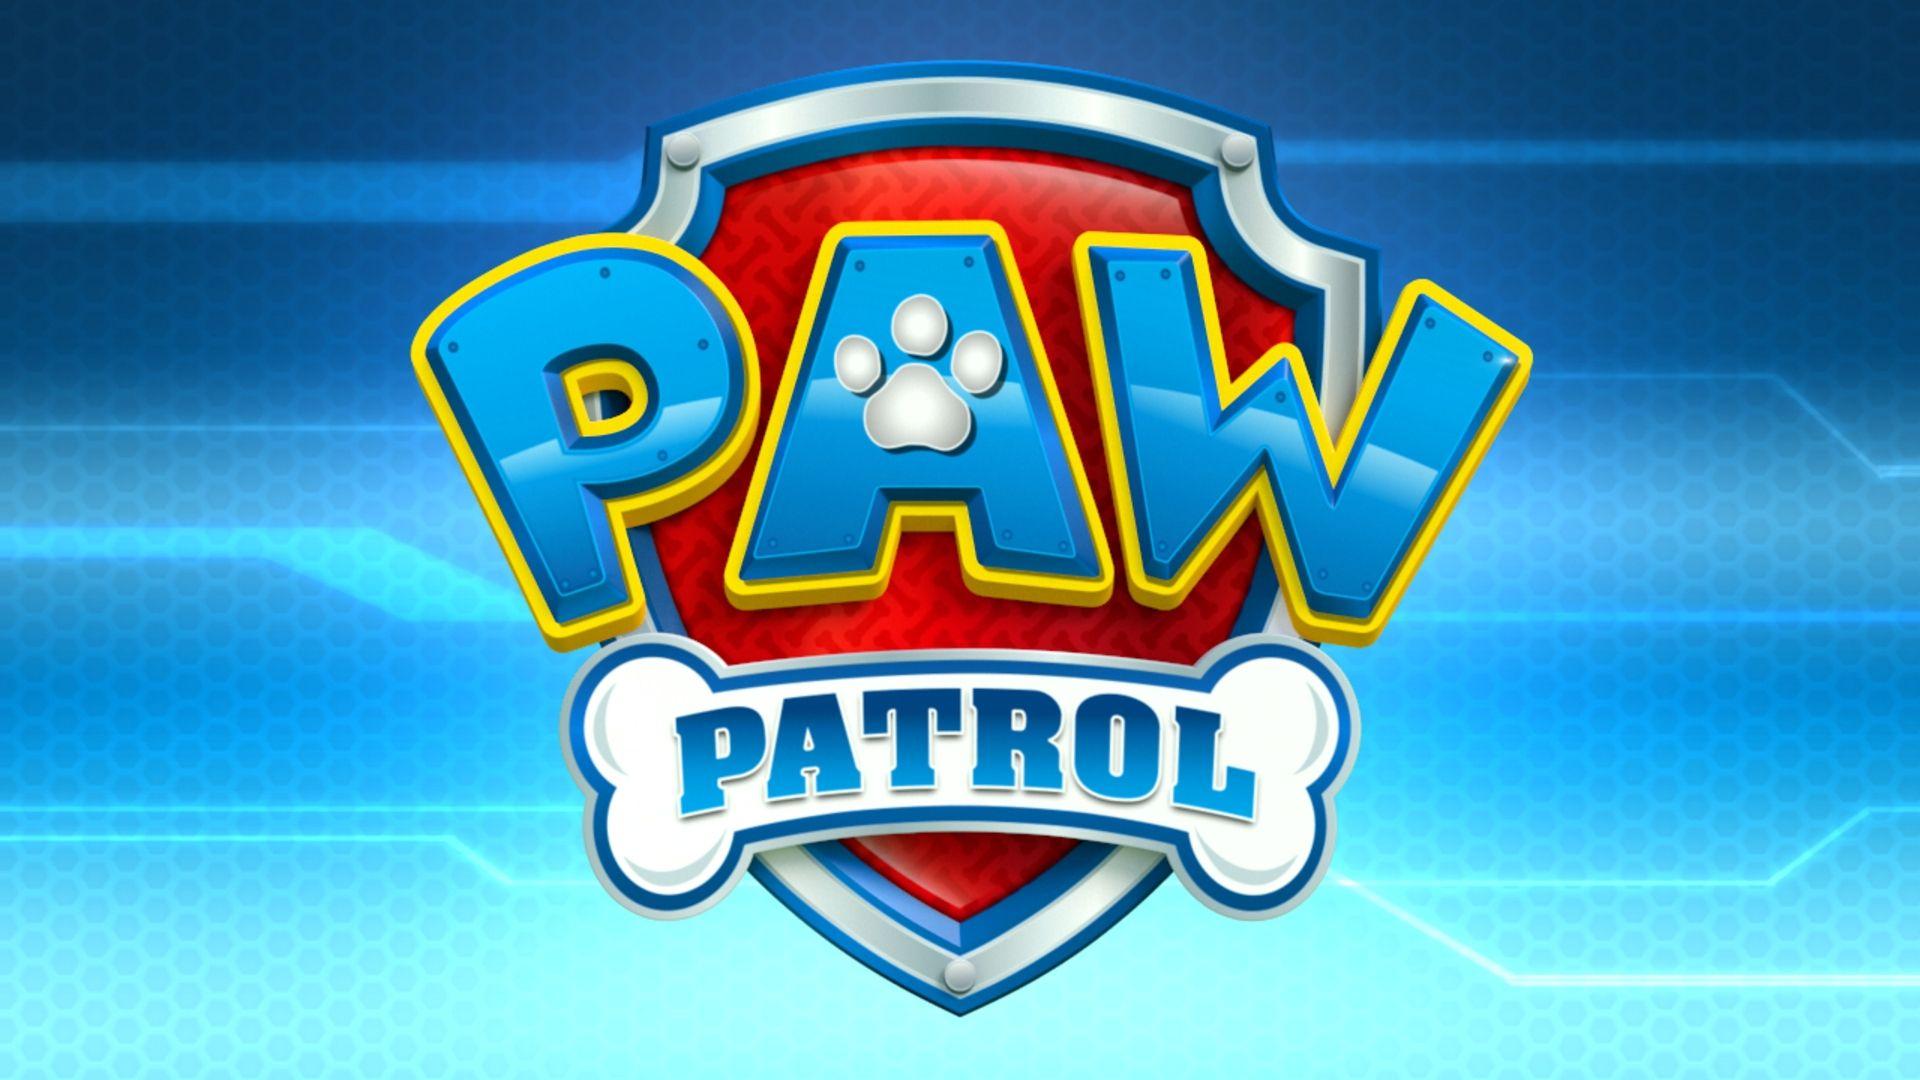 Debona Paw Patrol Wallpaper Kids Wallpaper Decoratingbm 550 510 Paw Patrol Pictures Wallpapers 24 Wallpapers Adorable Wallp Paw Kids Wallpaper Paw Patrol